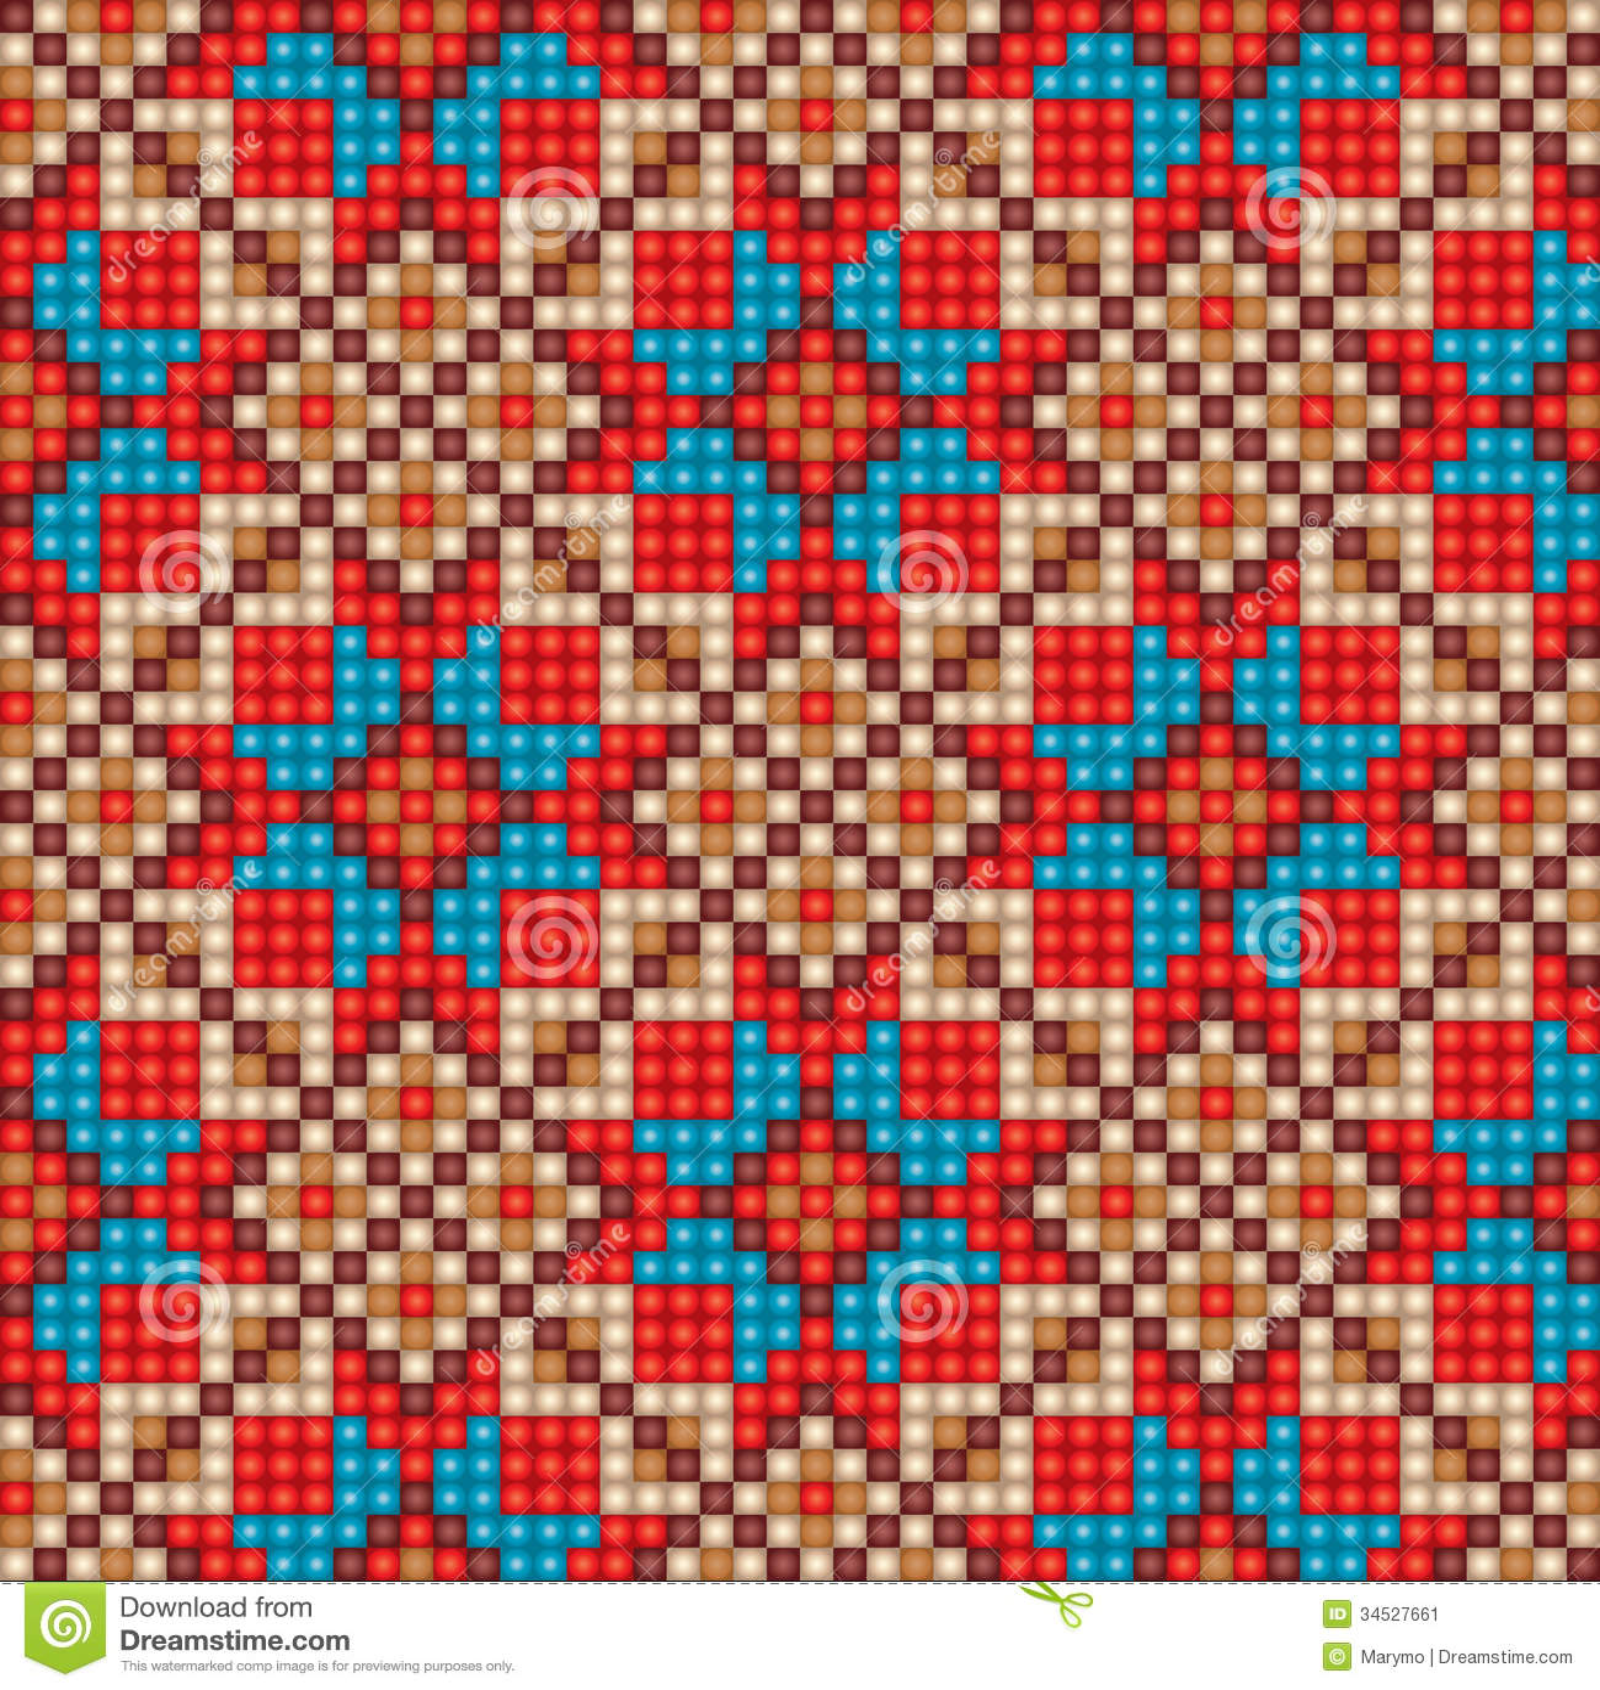 Minecraft Inspiration On Pinterest Mosaic Patterns